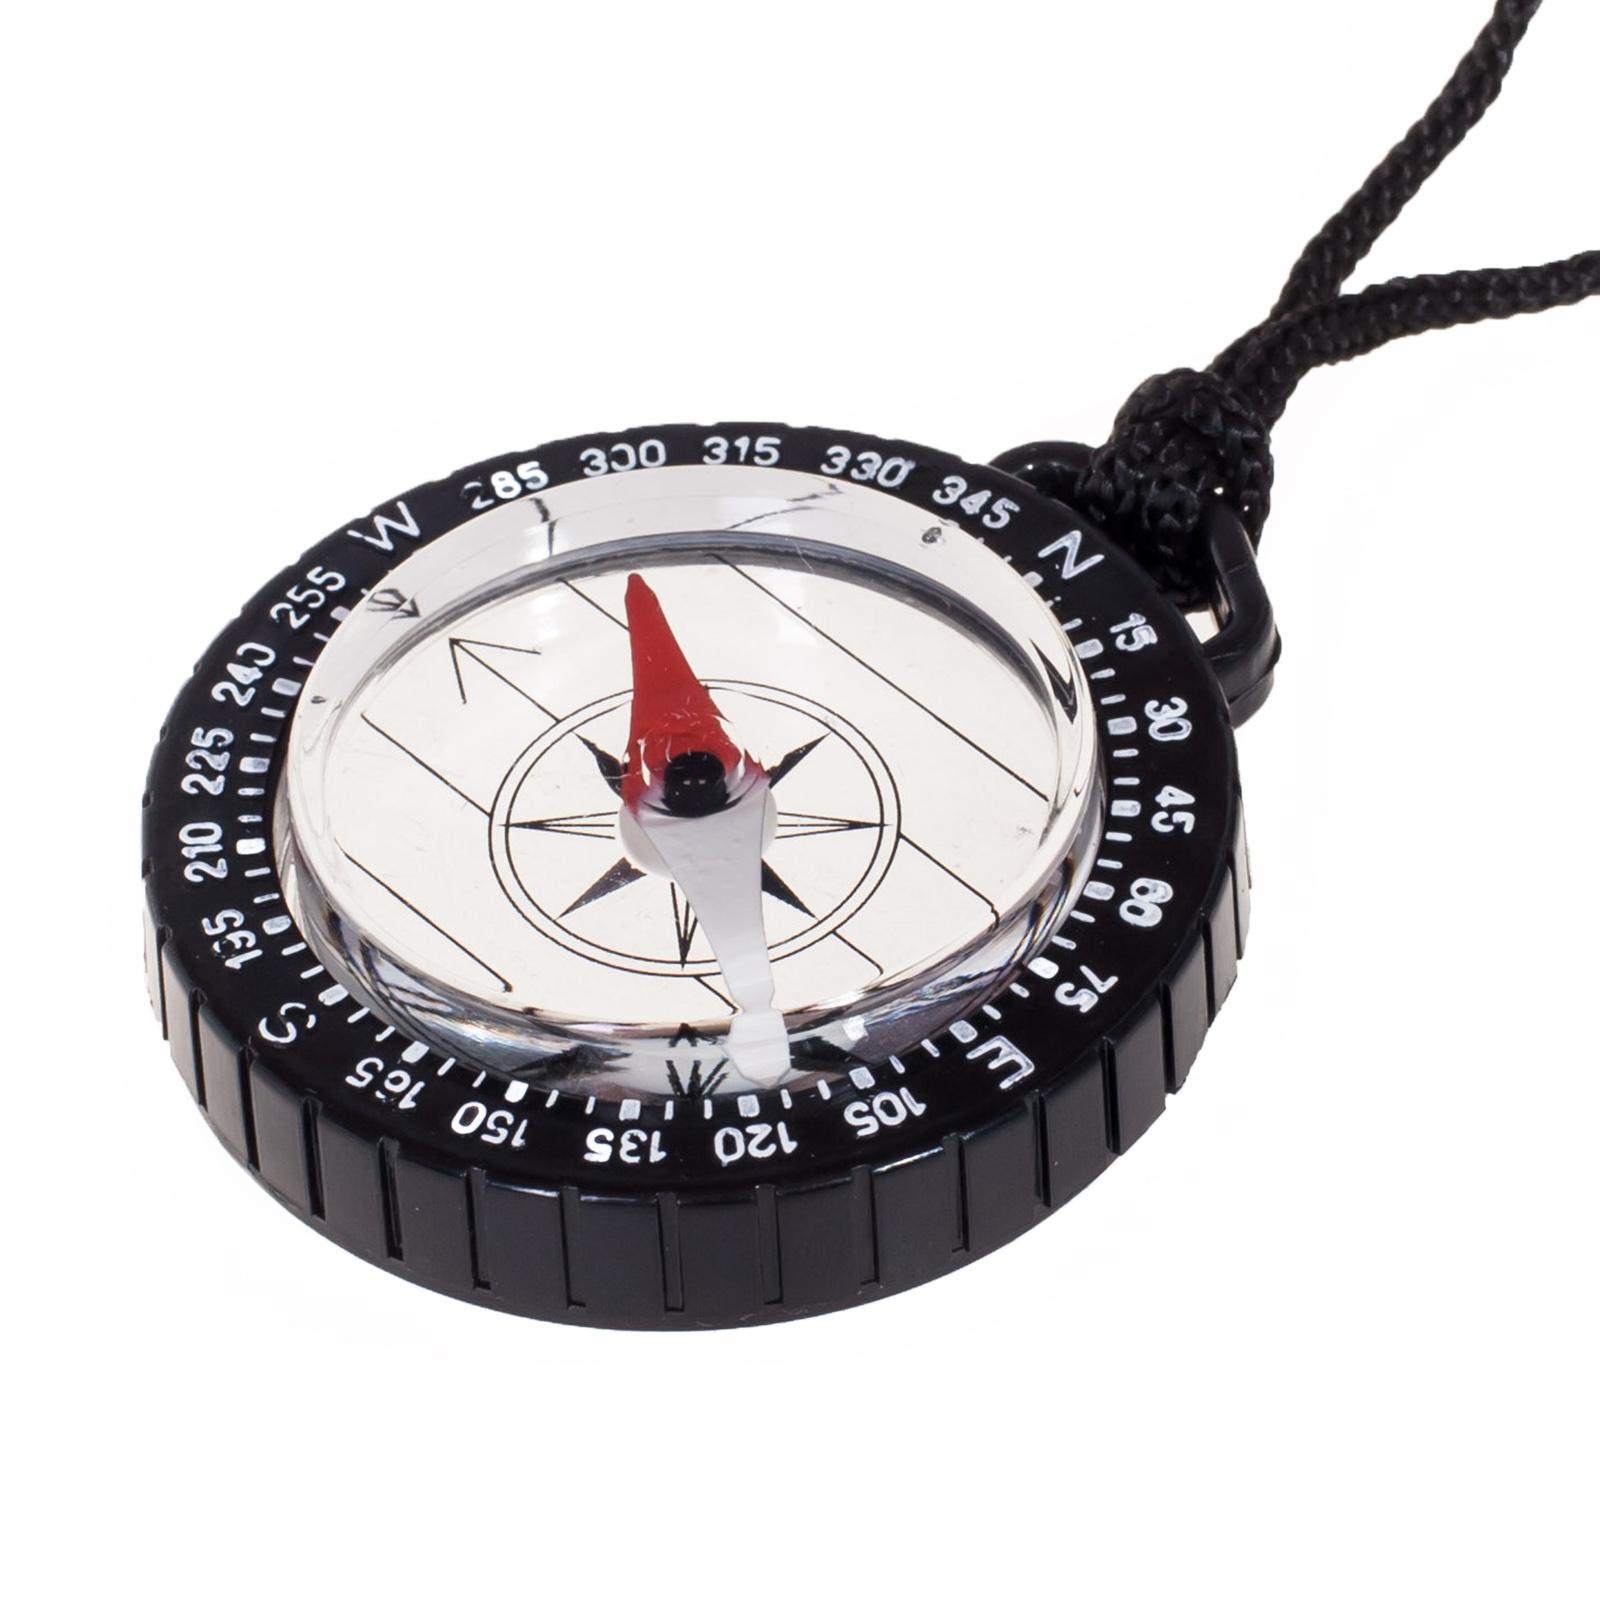 Заказать онлайн компас на шею